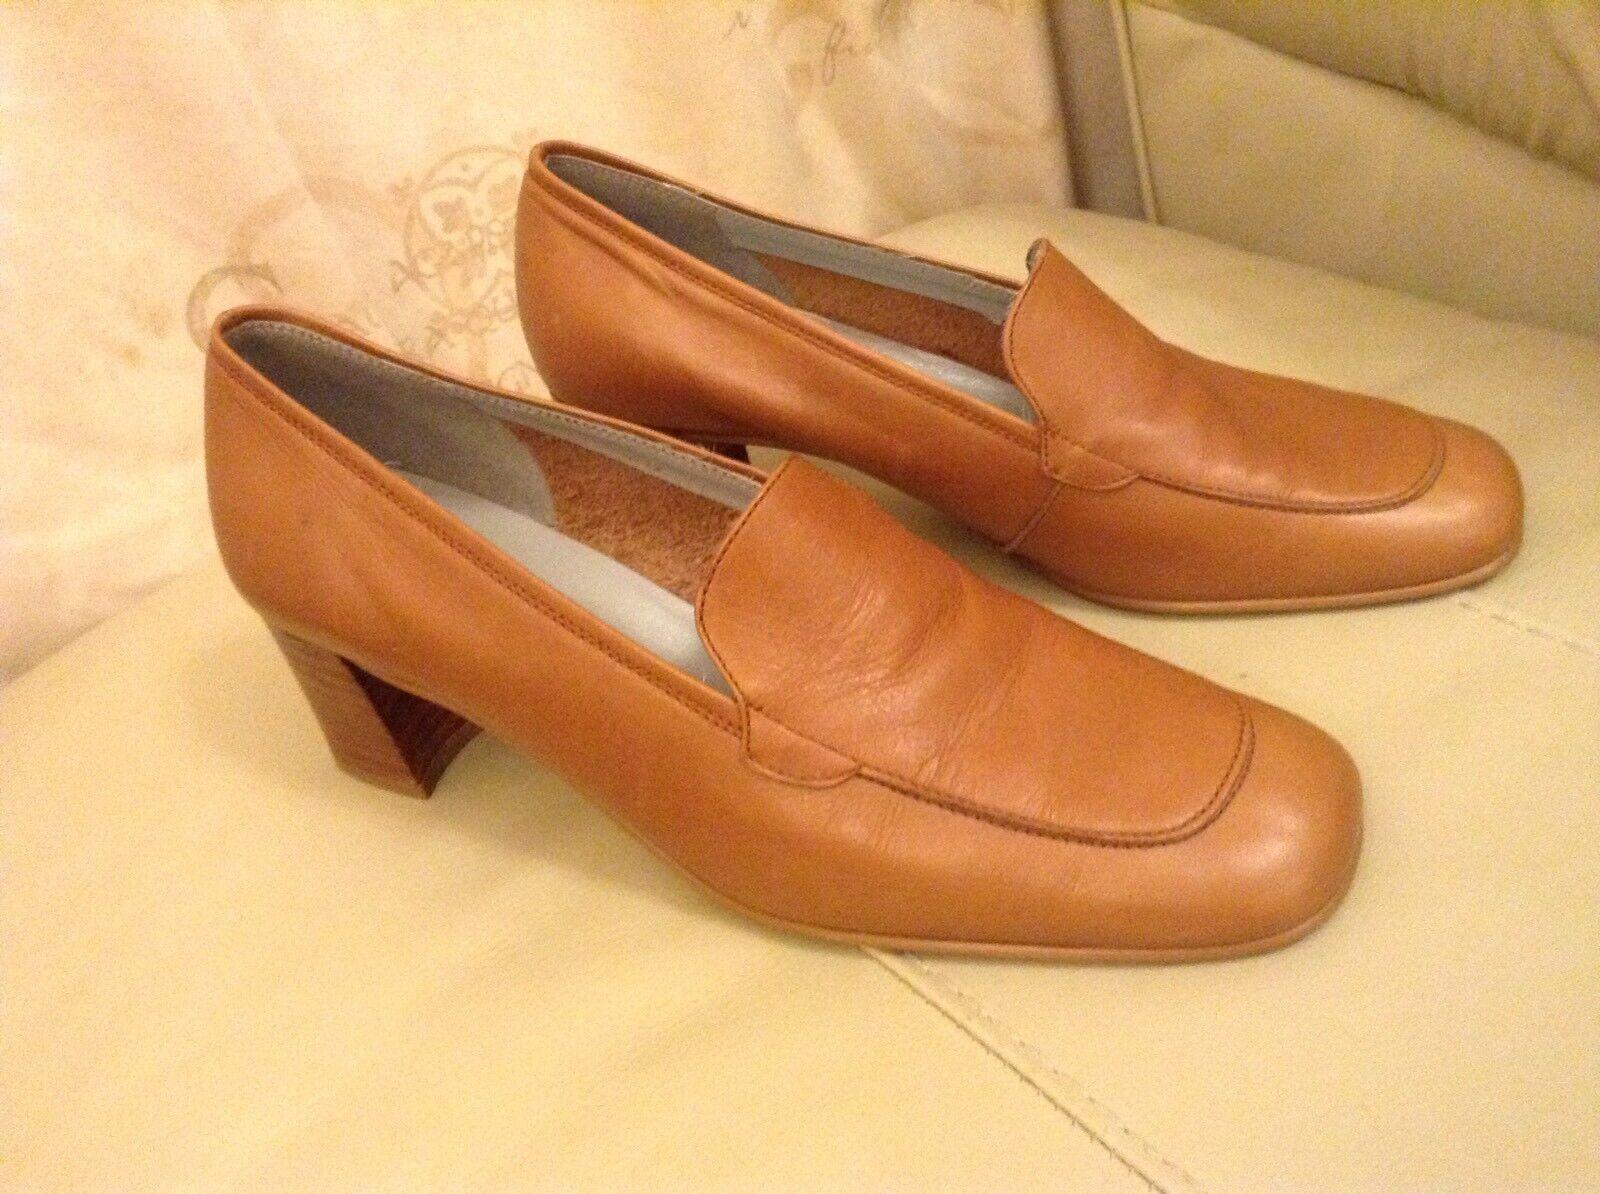 New Renatta JopSize 39  40 ( UK Size 6 To 6.5) Tan Leather Block Heel shoes